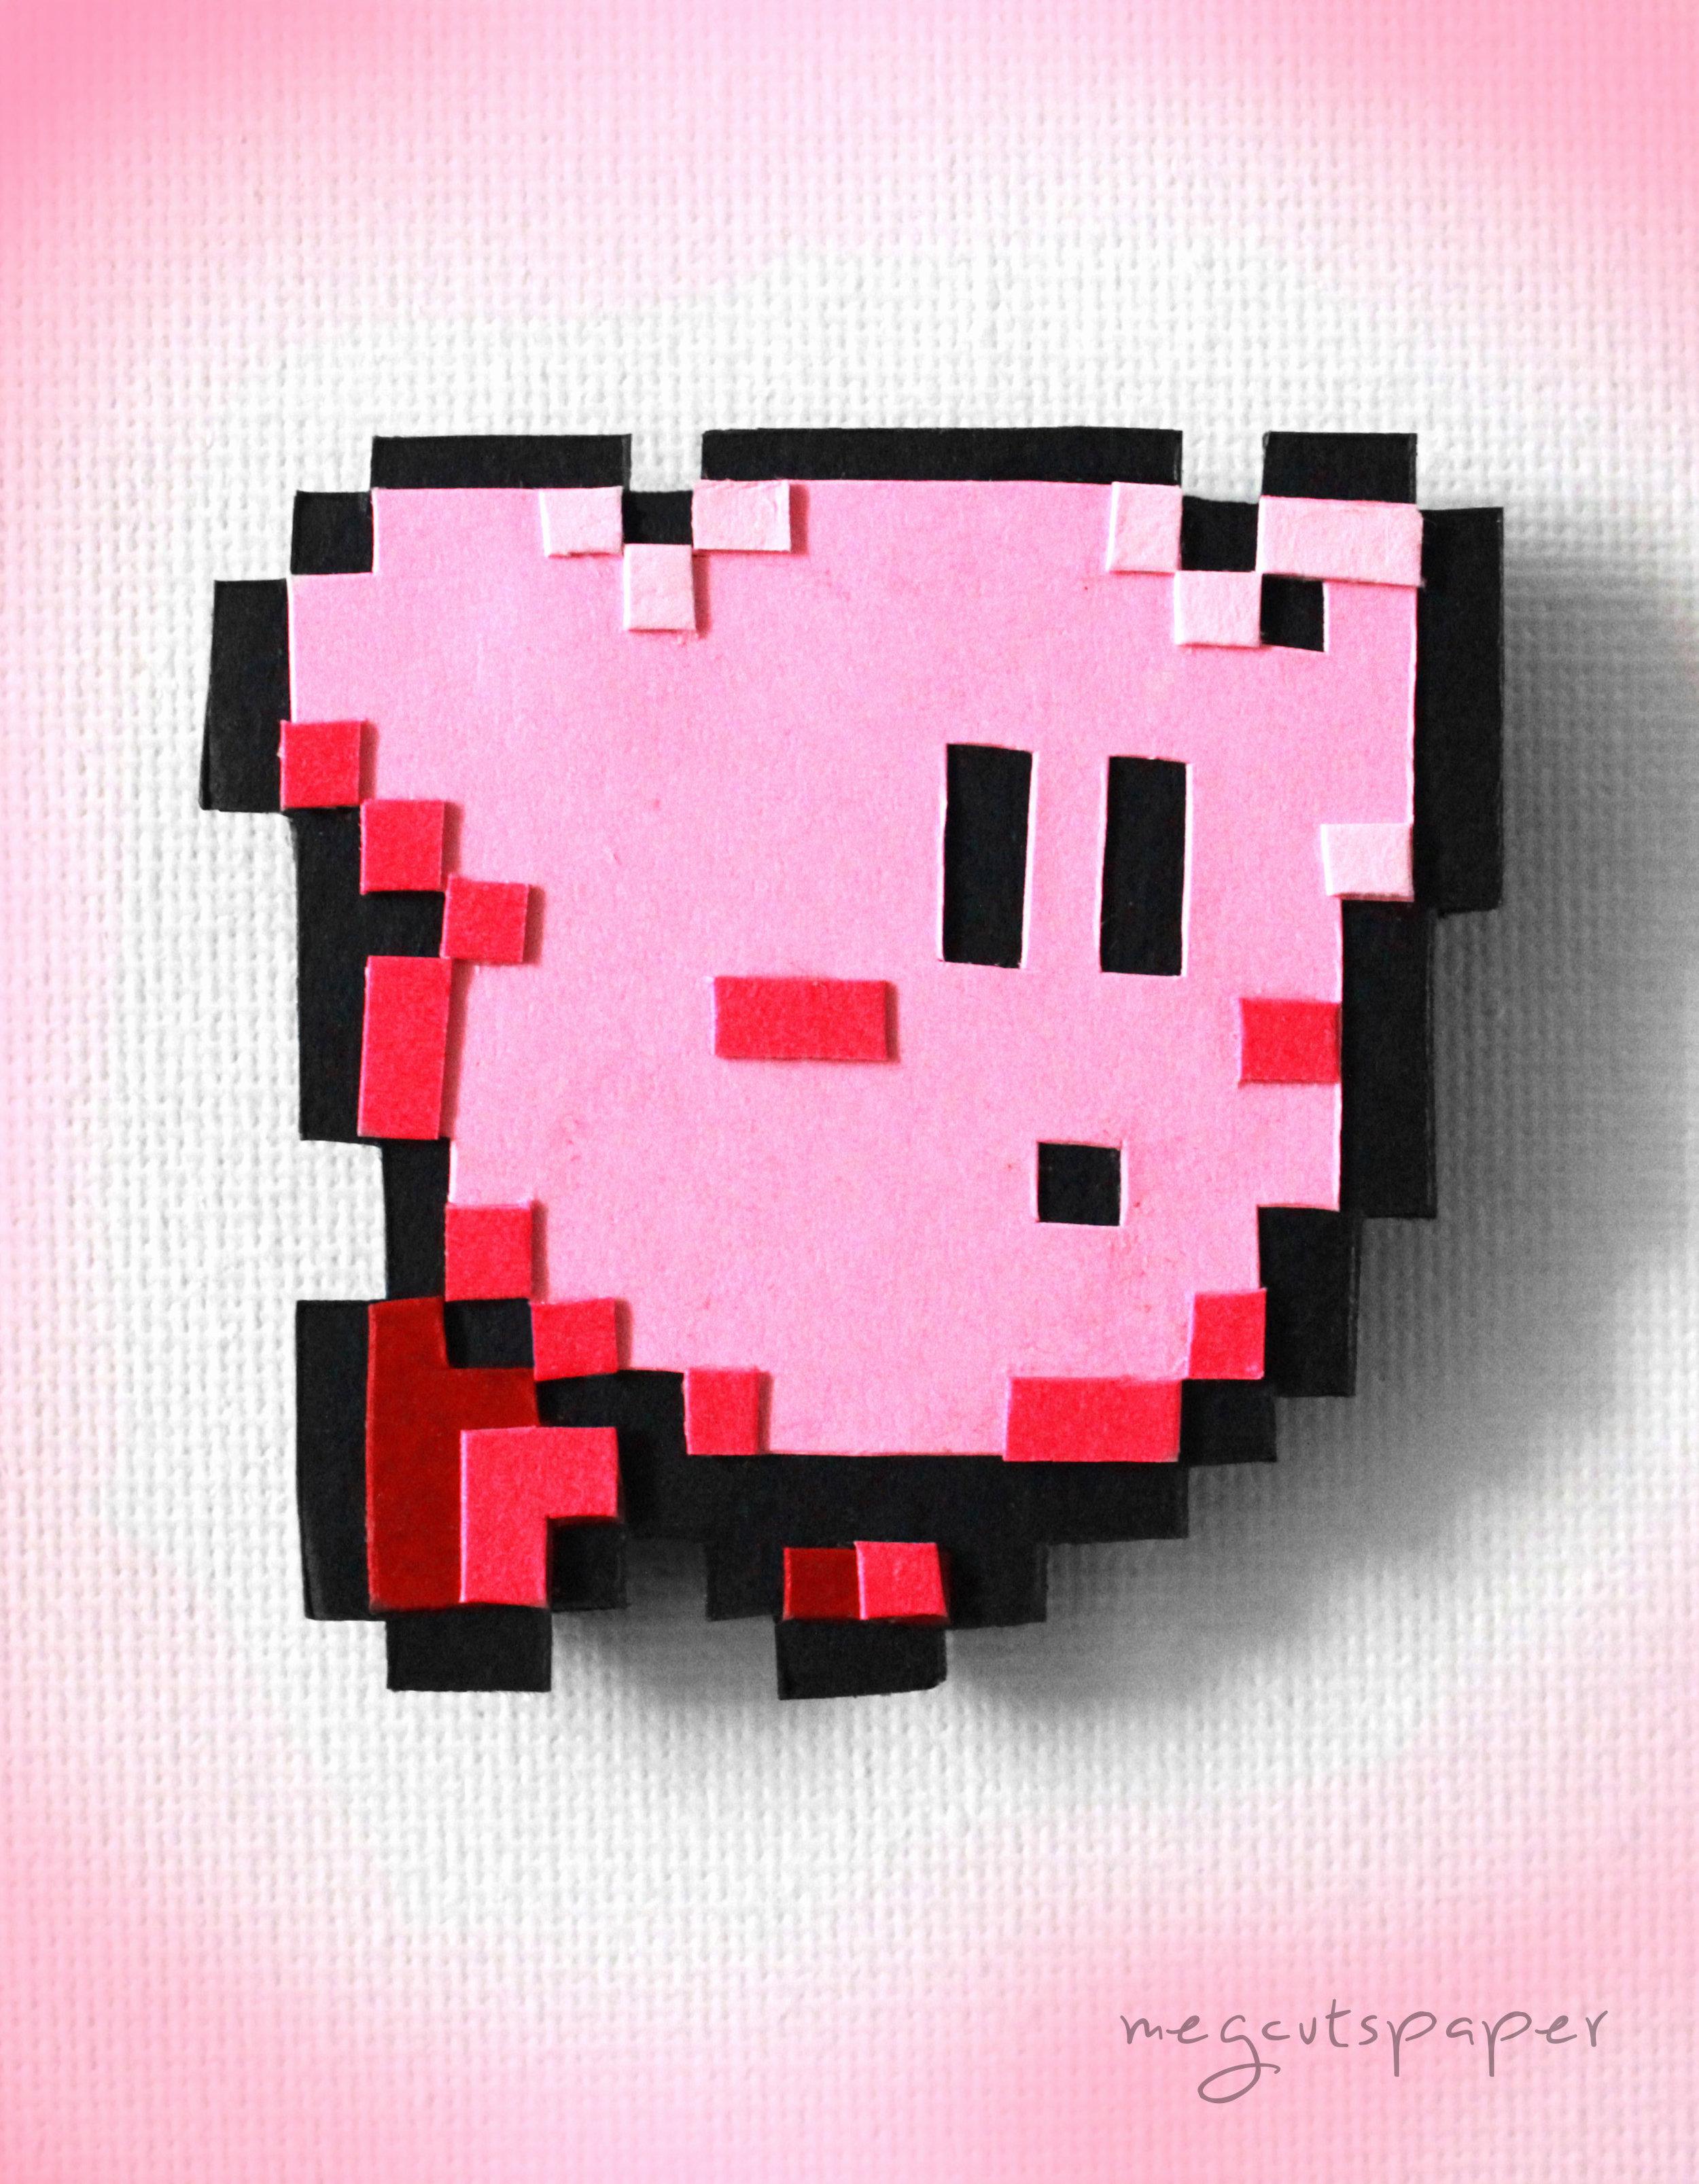 Megcutspaper_Kirby_Magnet_Papercut.jpg